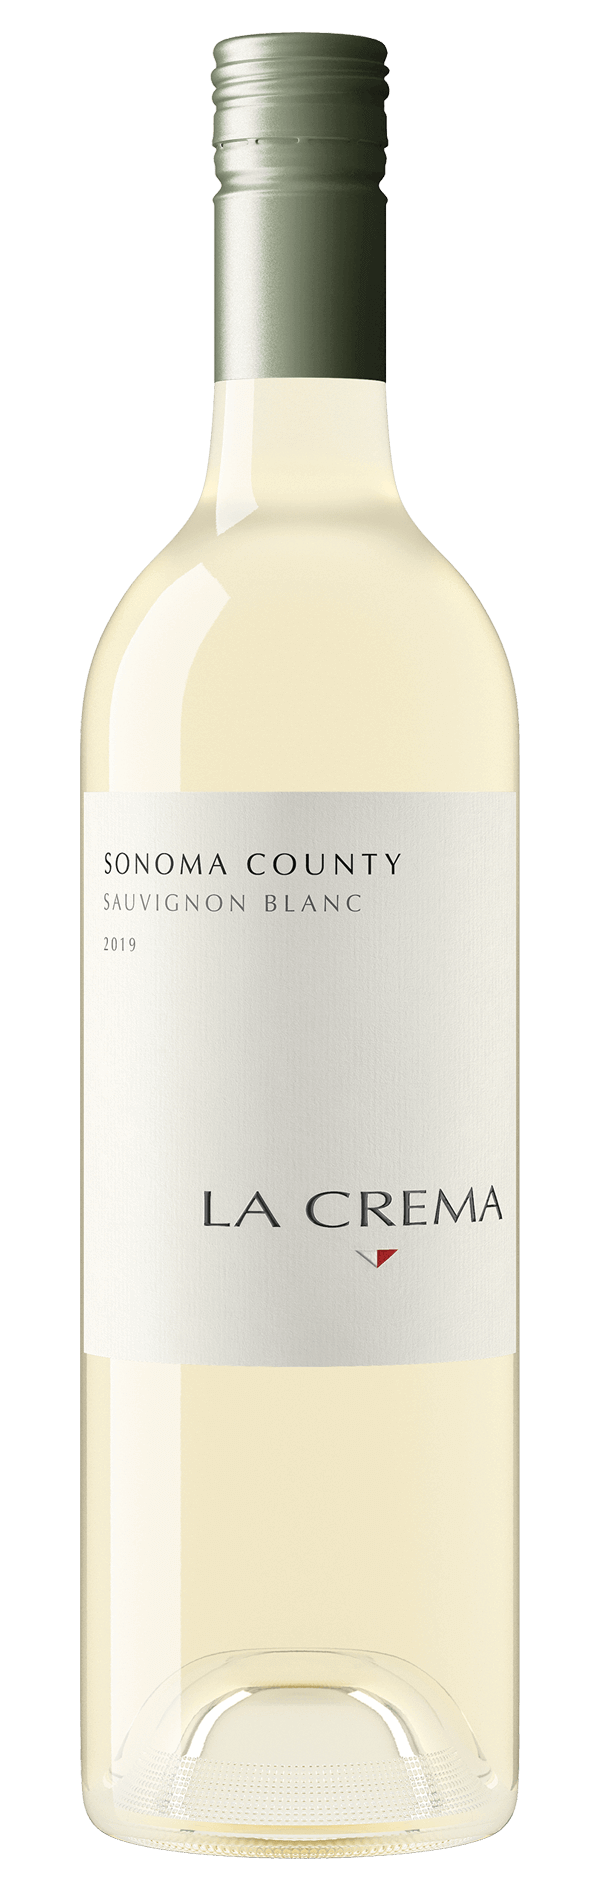 2019 Sonoma County Sauvignon Blanc